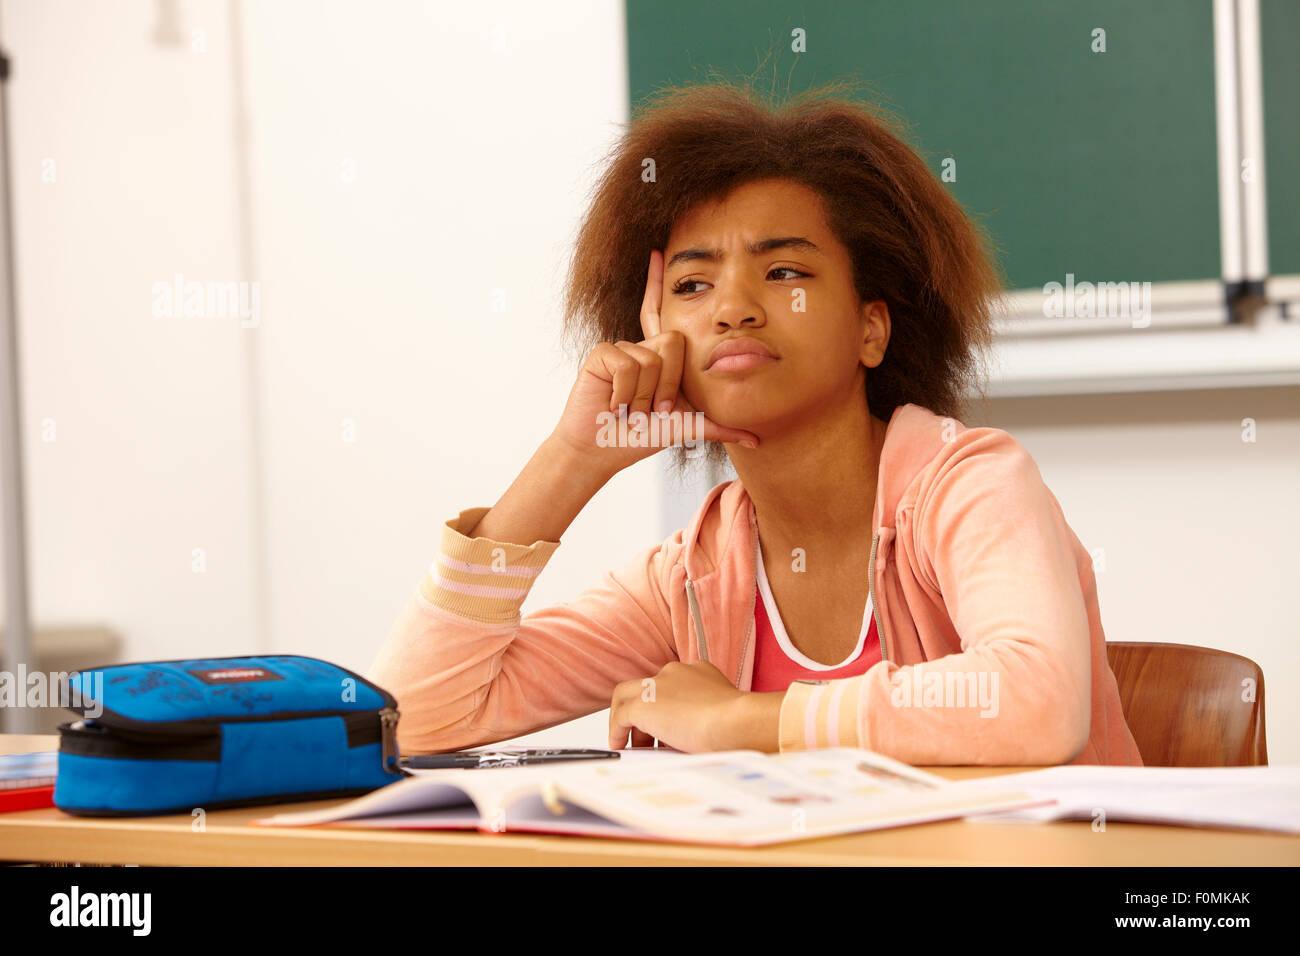 Thinking Girl in school - Stock Image